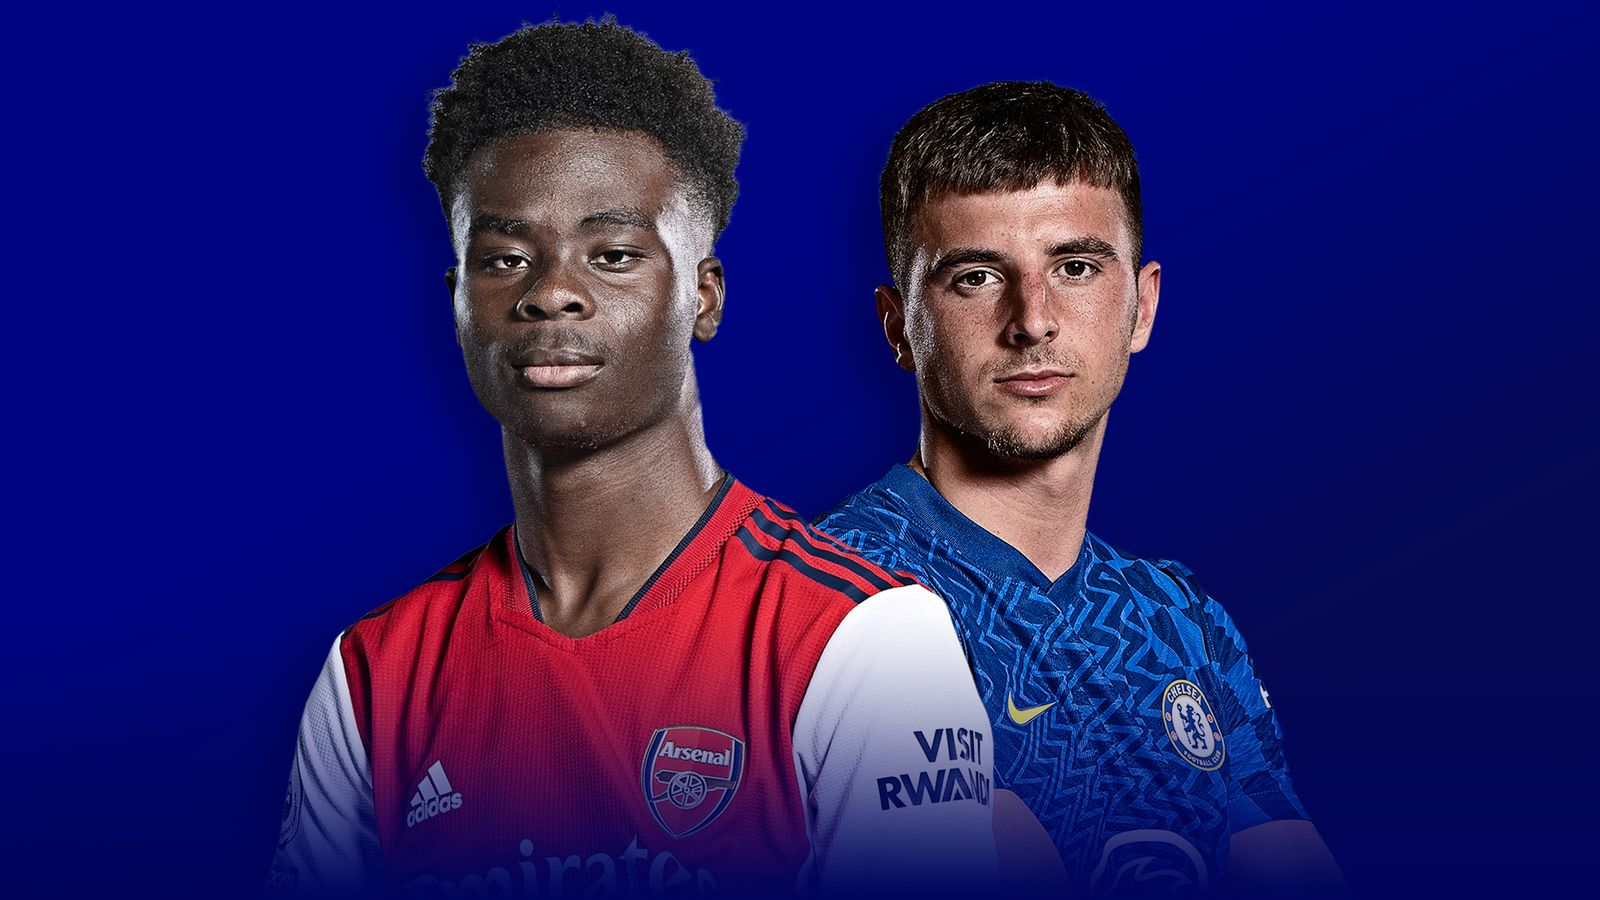 Arsenal vs Chelsea: Premier League preview, team news, TV channel, stats, prediction, kick-off time